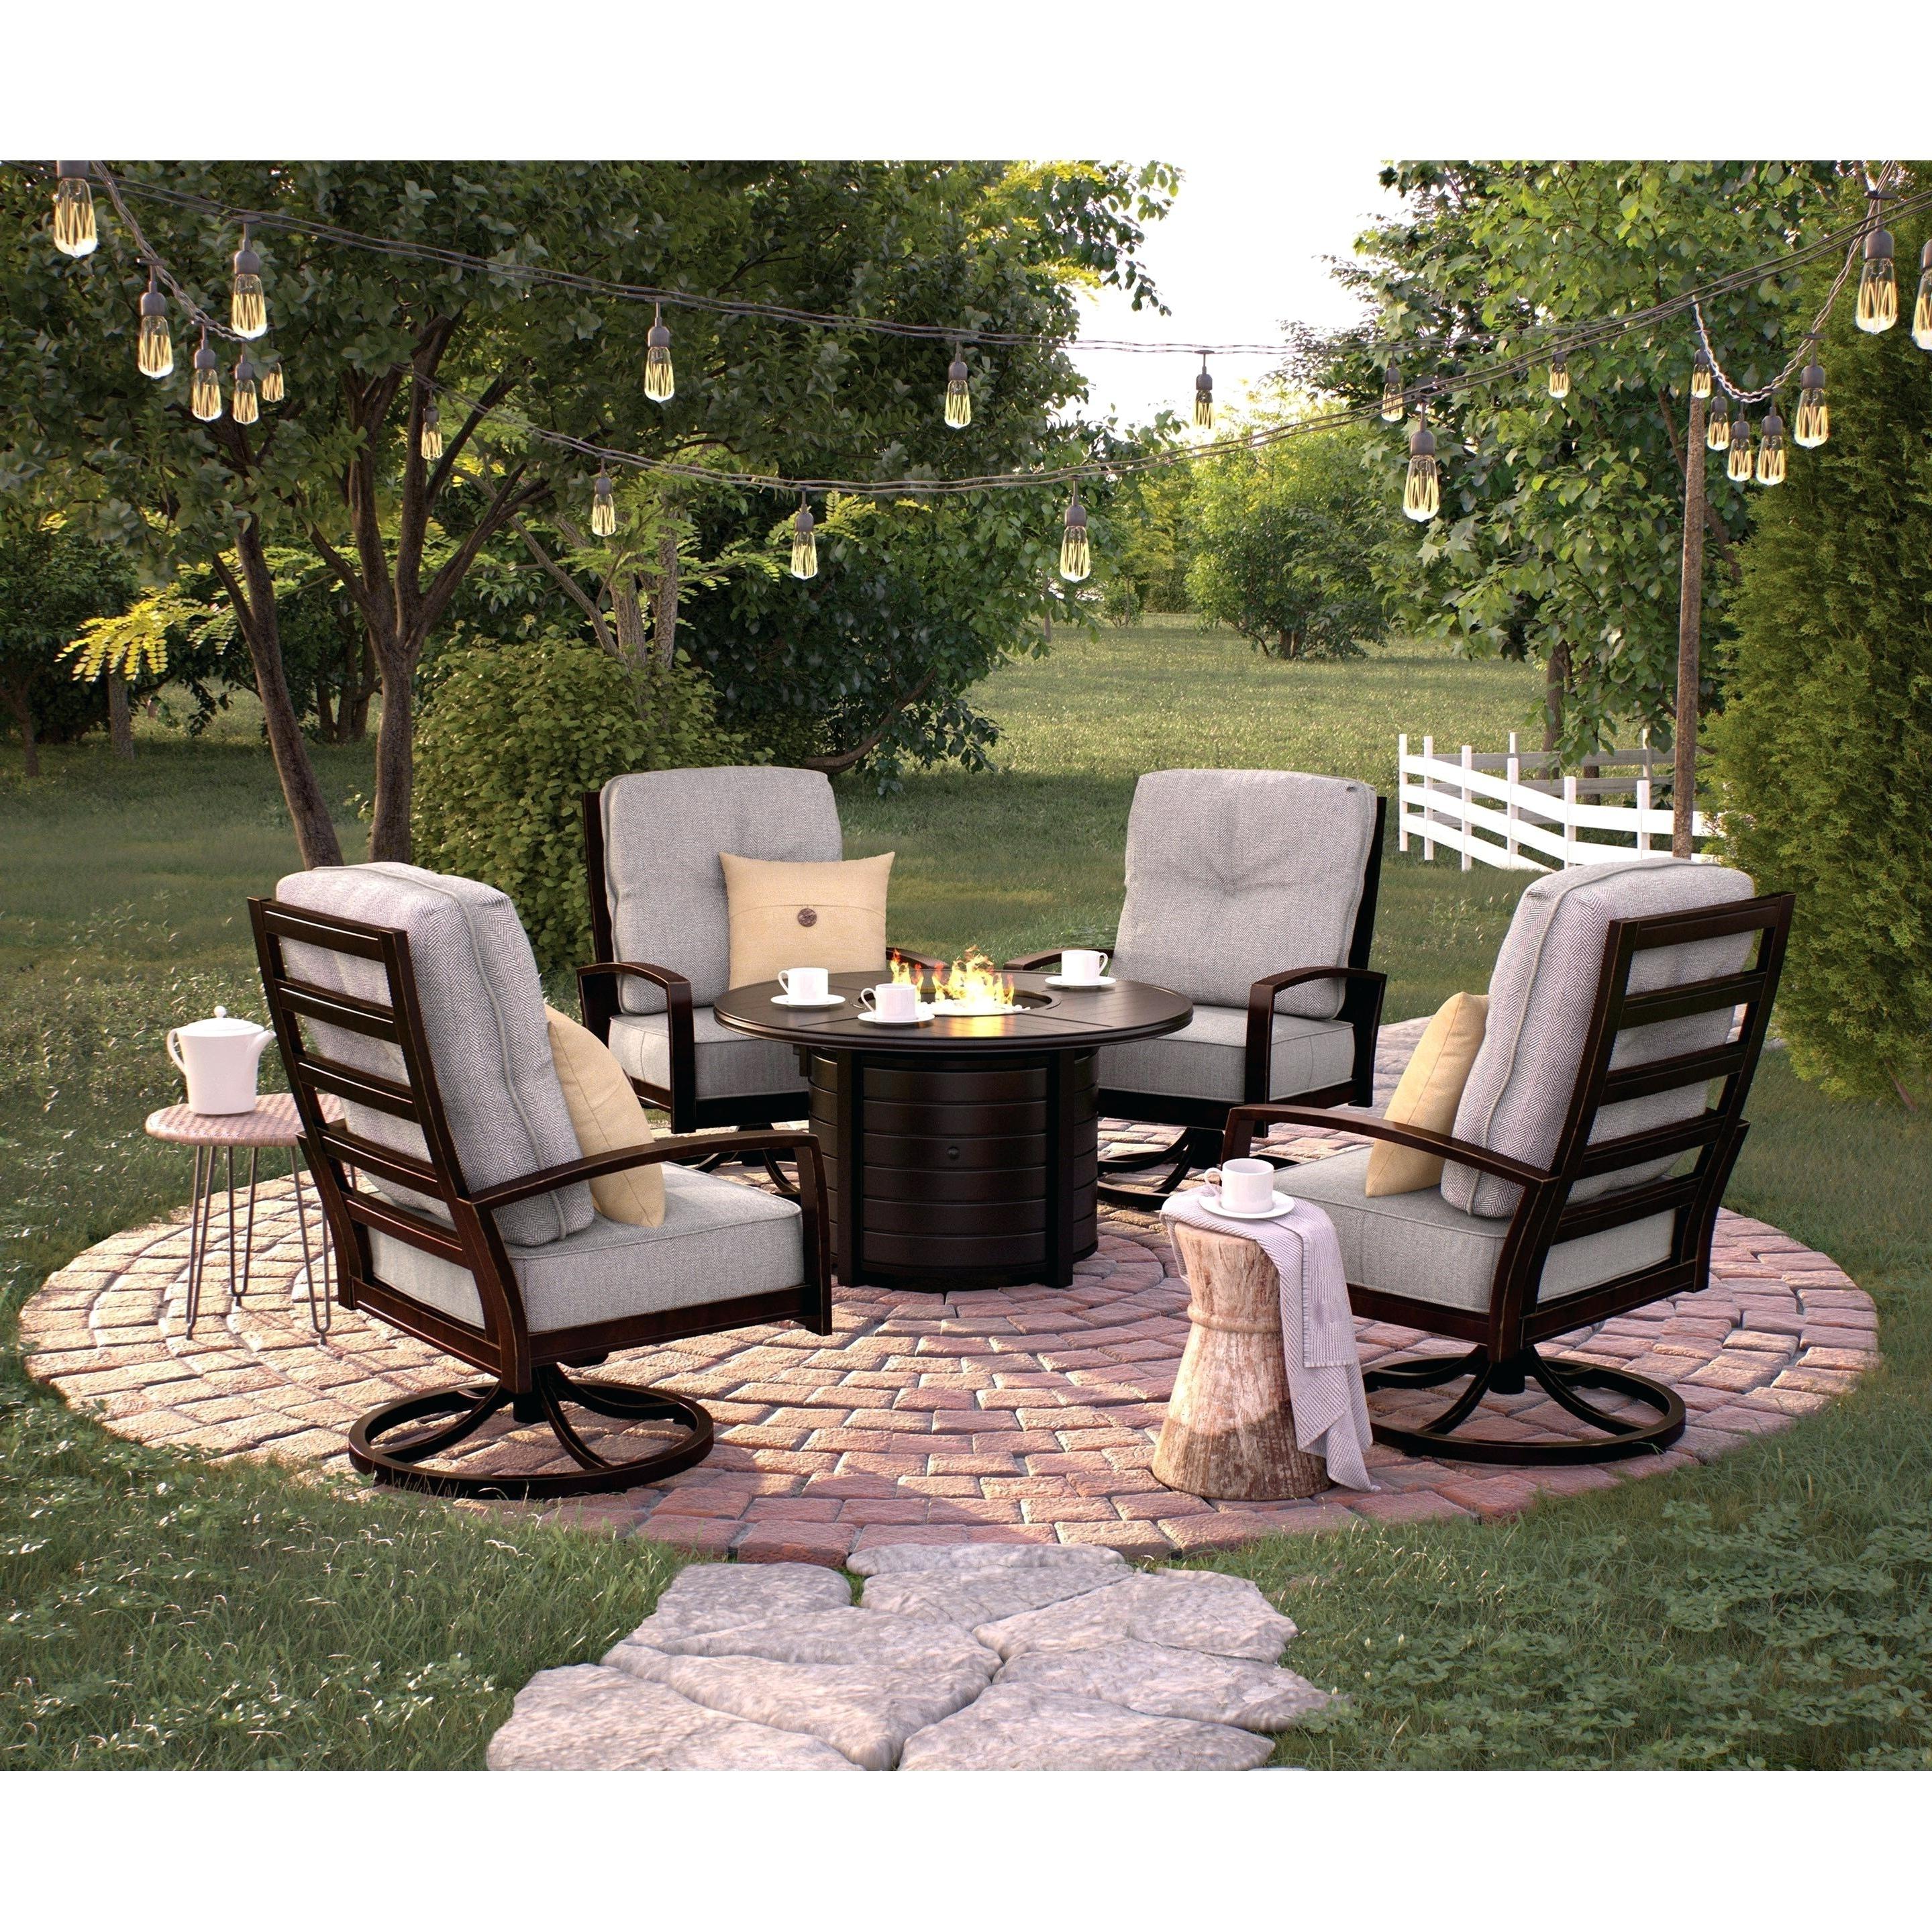 Wayfair Outdoor Patio Conversation Sets Throughout Popular Target Patio Furniture Conversation Sets Wayfair Patio Furniture (View 12 of 15)